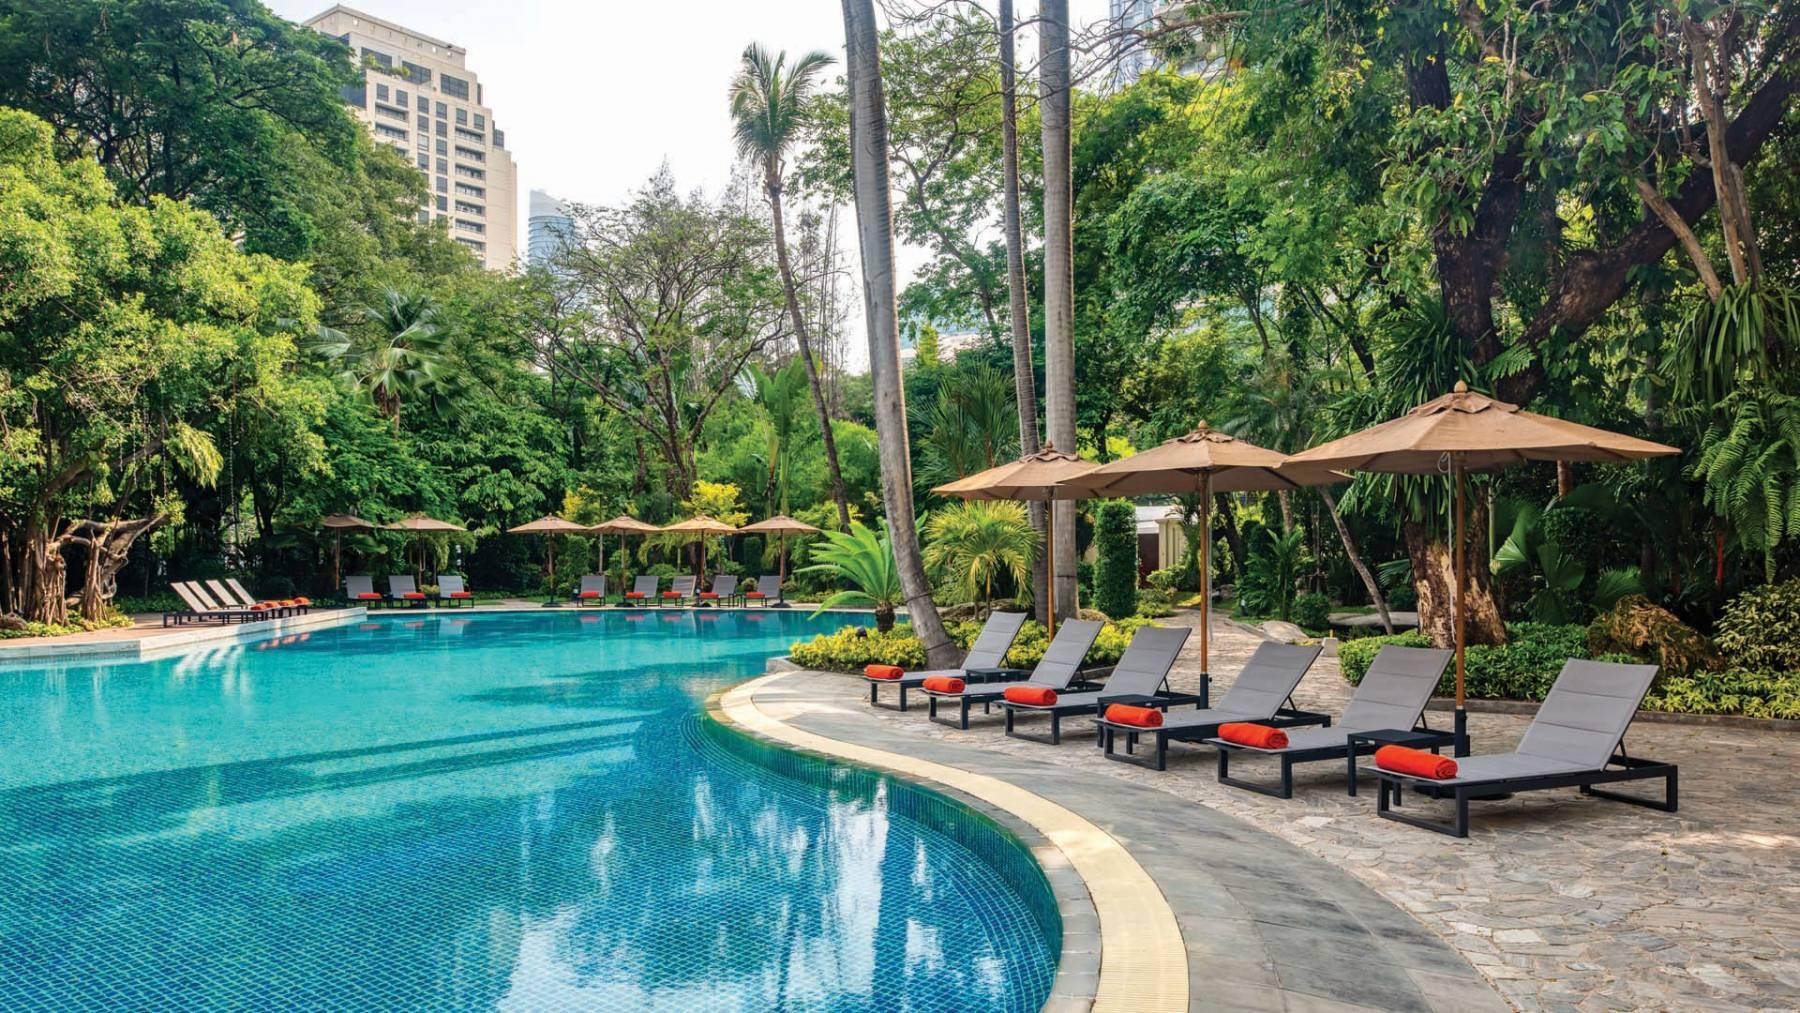 Bangkok resort hotel